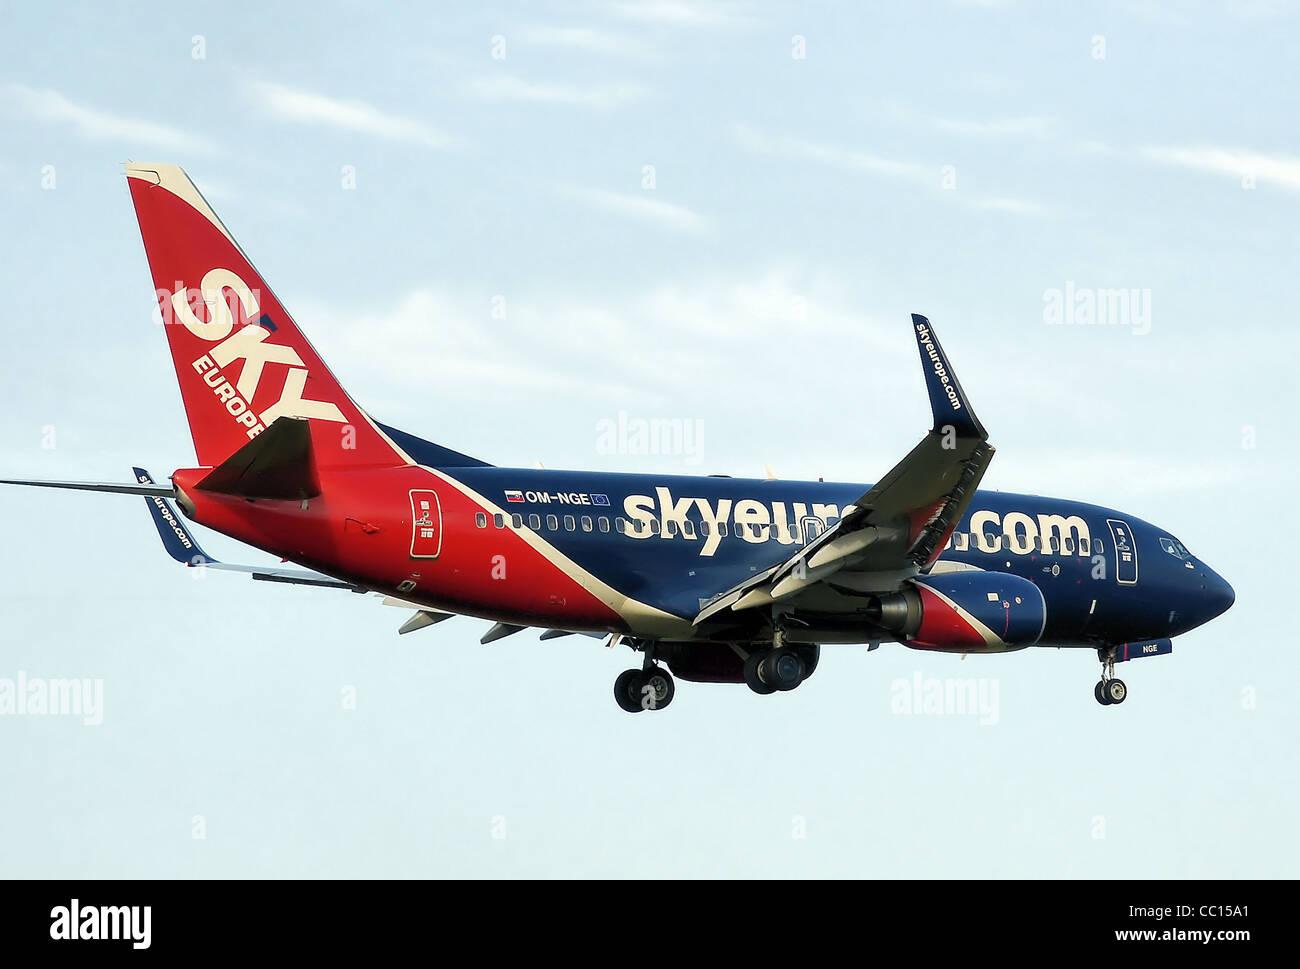 SkyEurope Airlines Boeing 737-700 (OM-NGE) lands at Birmingham International Airport, England. - Stock Image